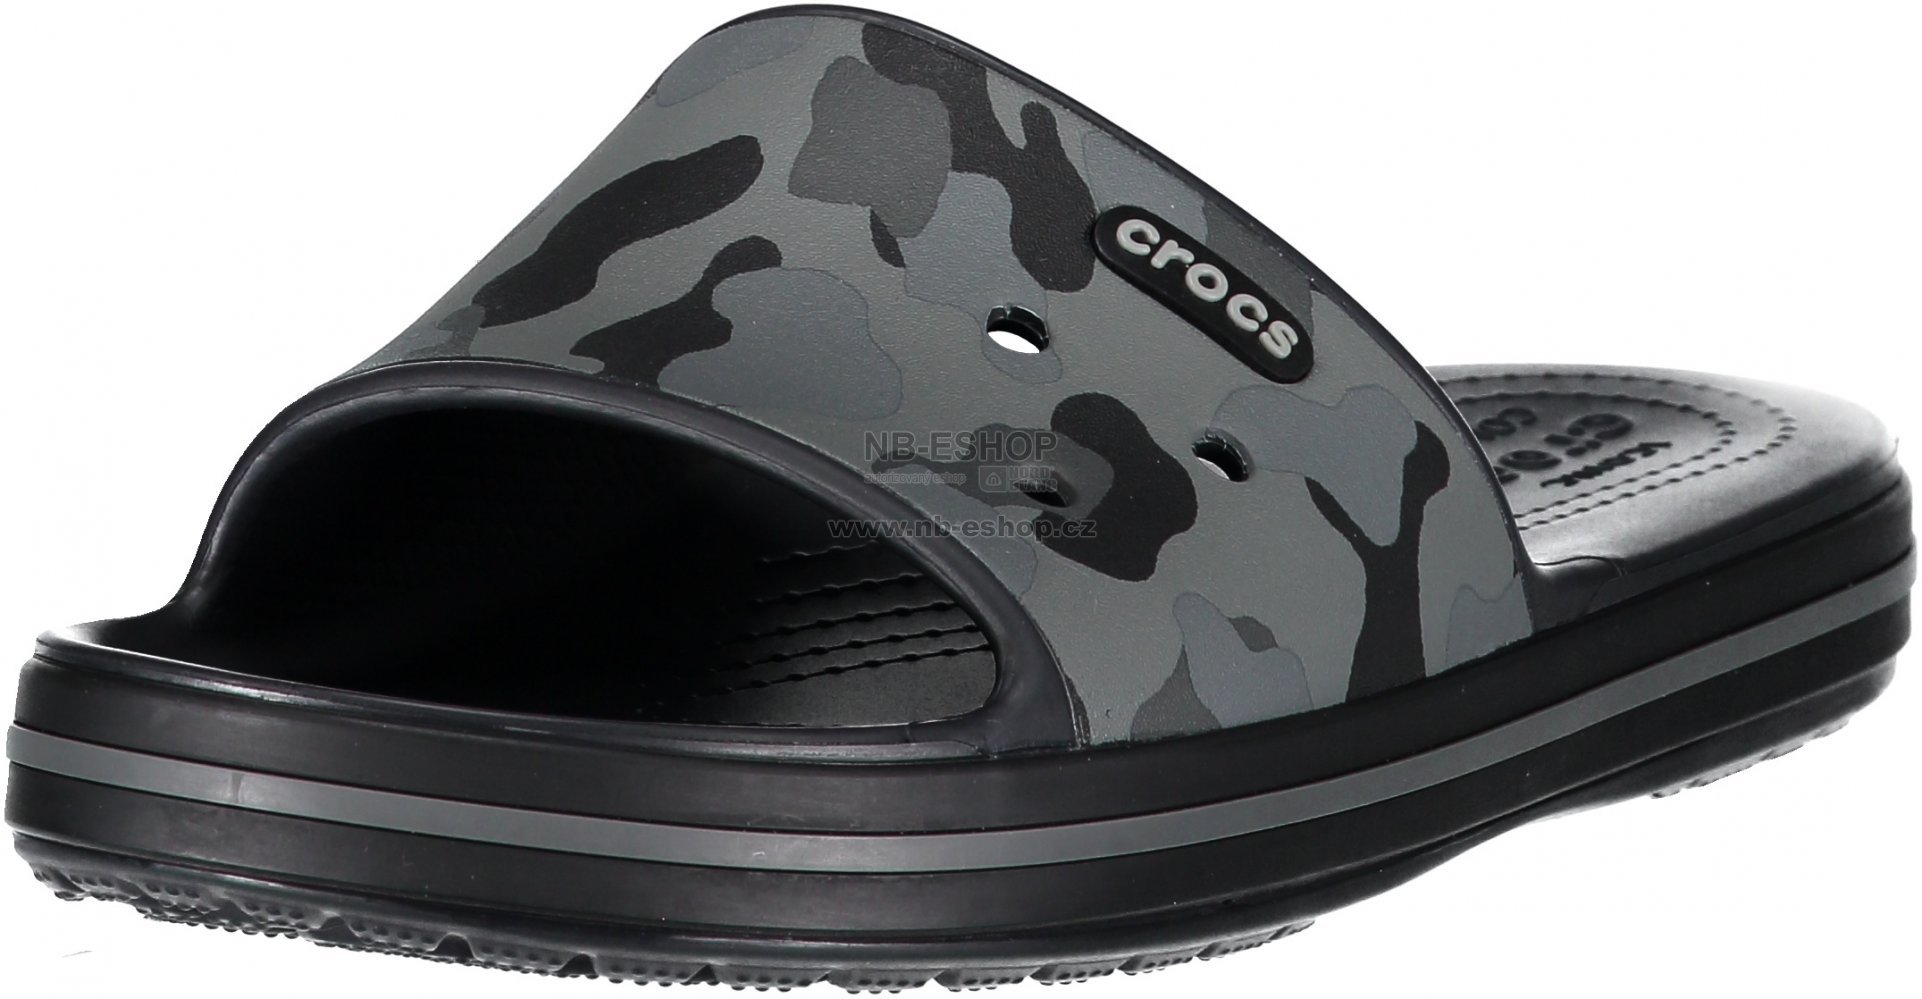 683f5332d8 Pánské pantofle CROCS CROCBAND III 205583-0DY SLATE GREY BLACK ...